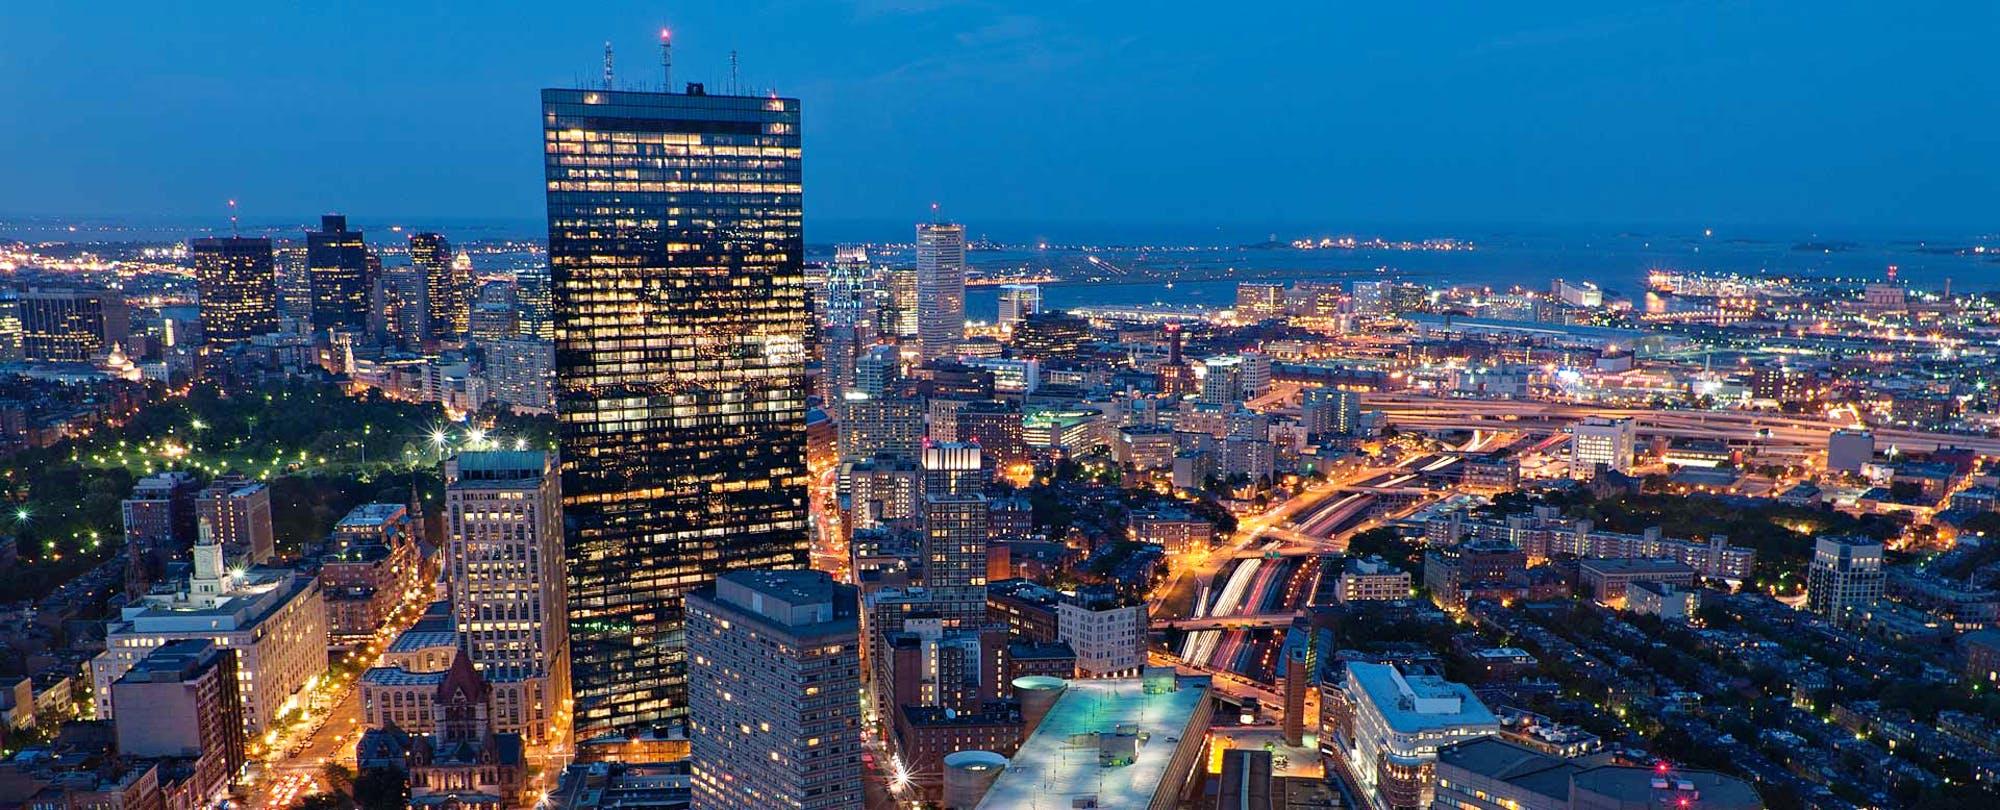 EdTech Revolutionaries: Spotlight on Six Boston Area Districts